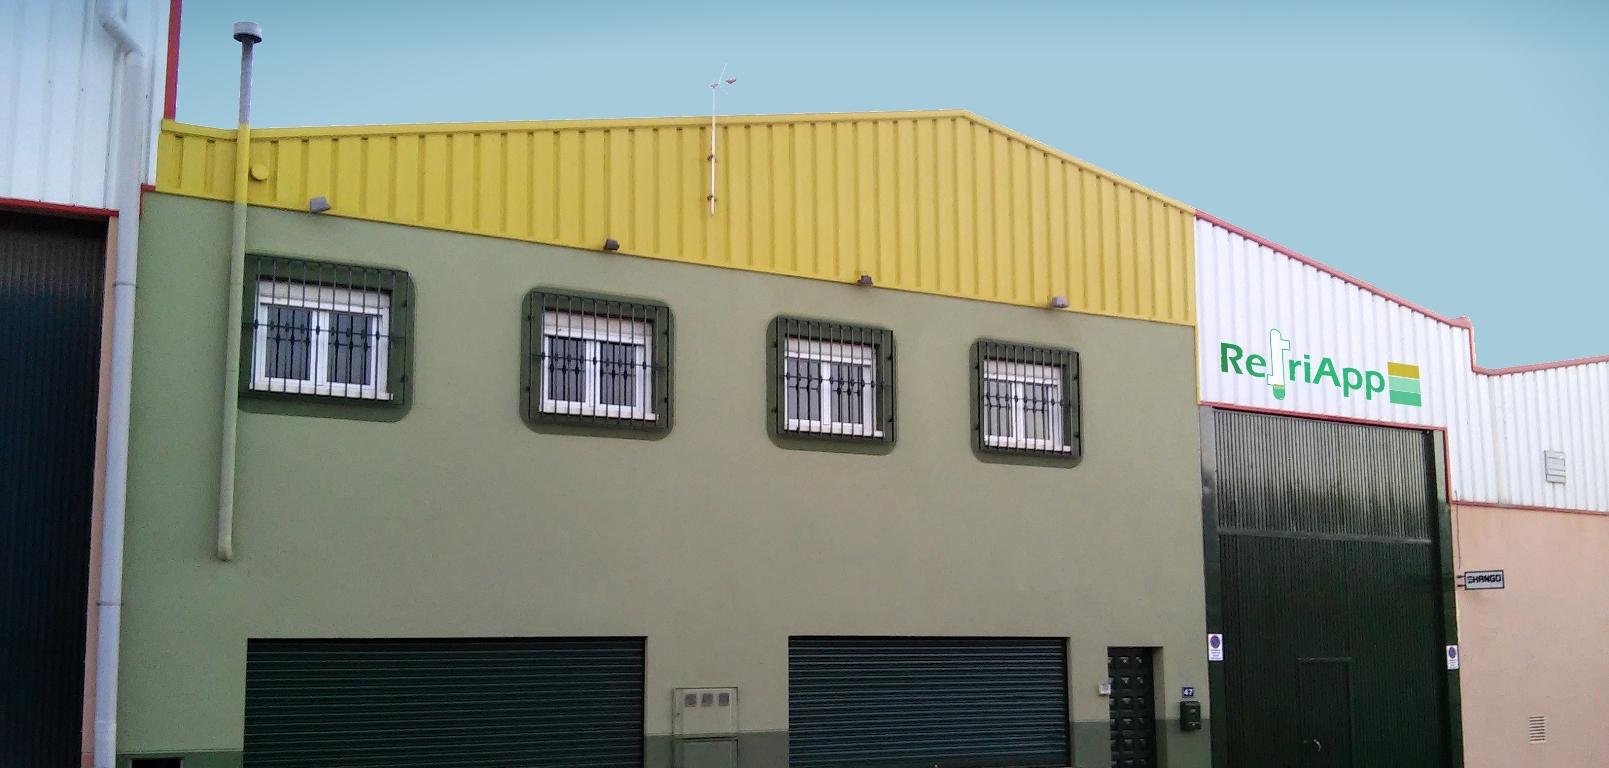 refriapp-fachada